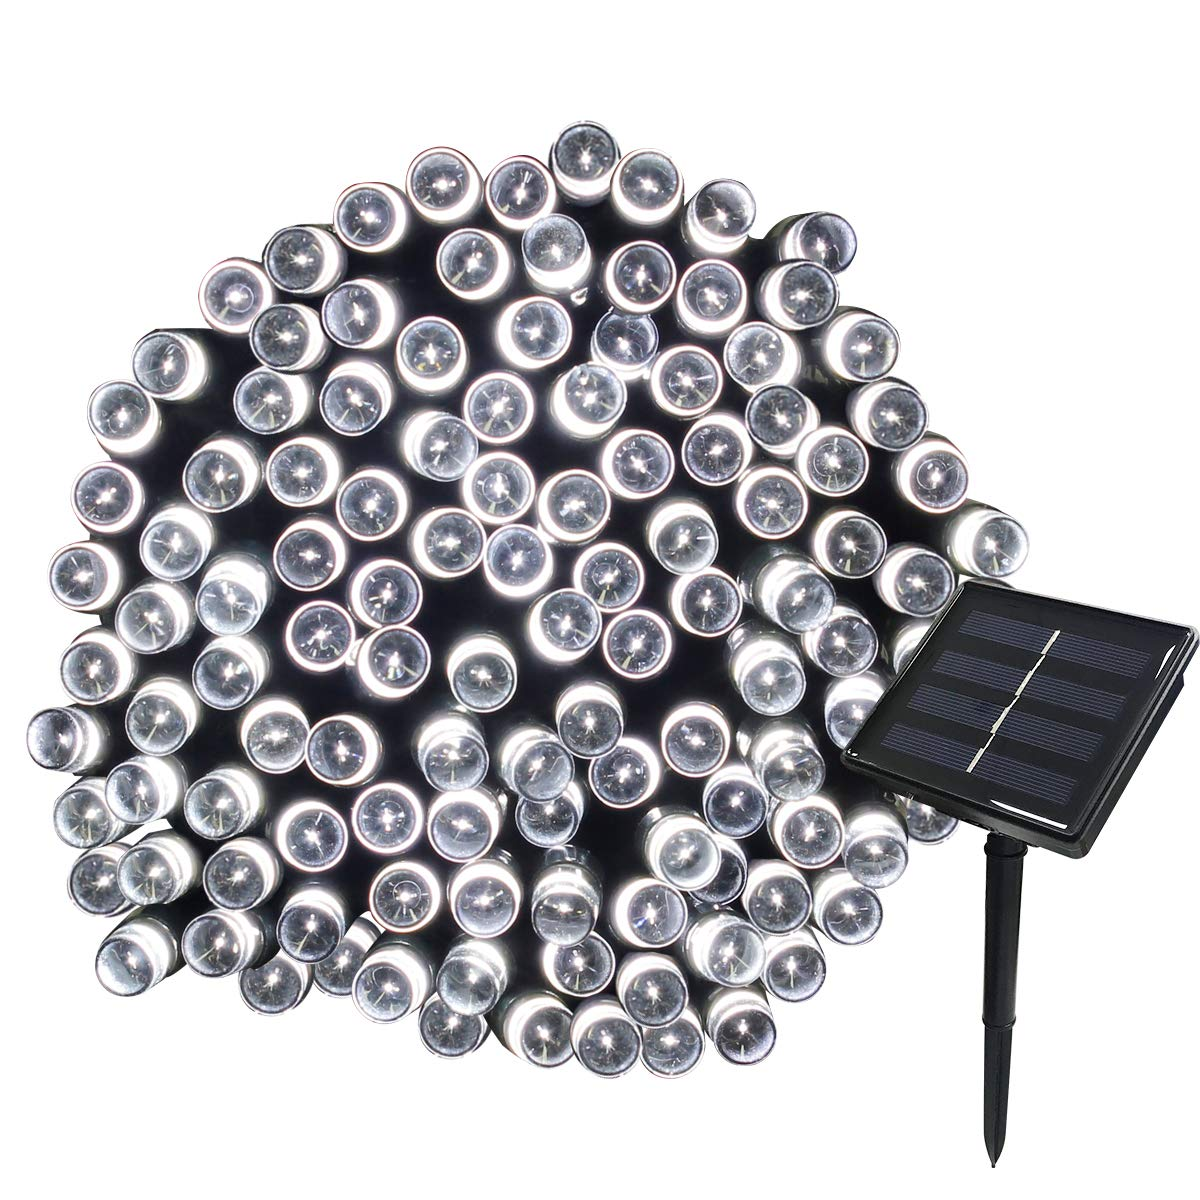 Yasolote 22M 200 LED Luci Giardino Energia Solare Luci da Esterno Luci Stringa da Energia Solare Illuminazione per Addobbi Natalizi Catene Luminosa Decorazione Natalizie Alebero di Natale Giardino Patio